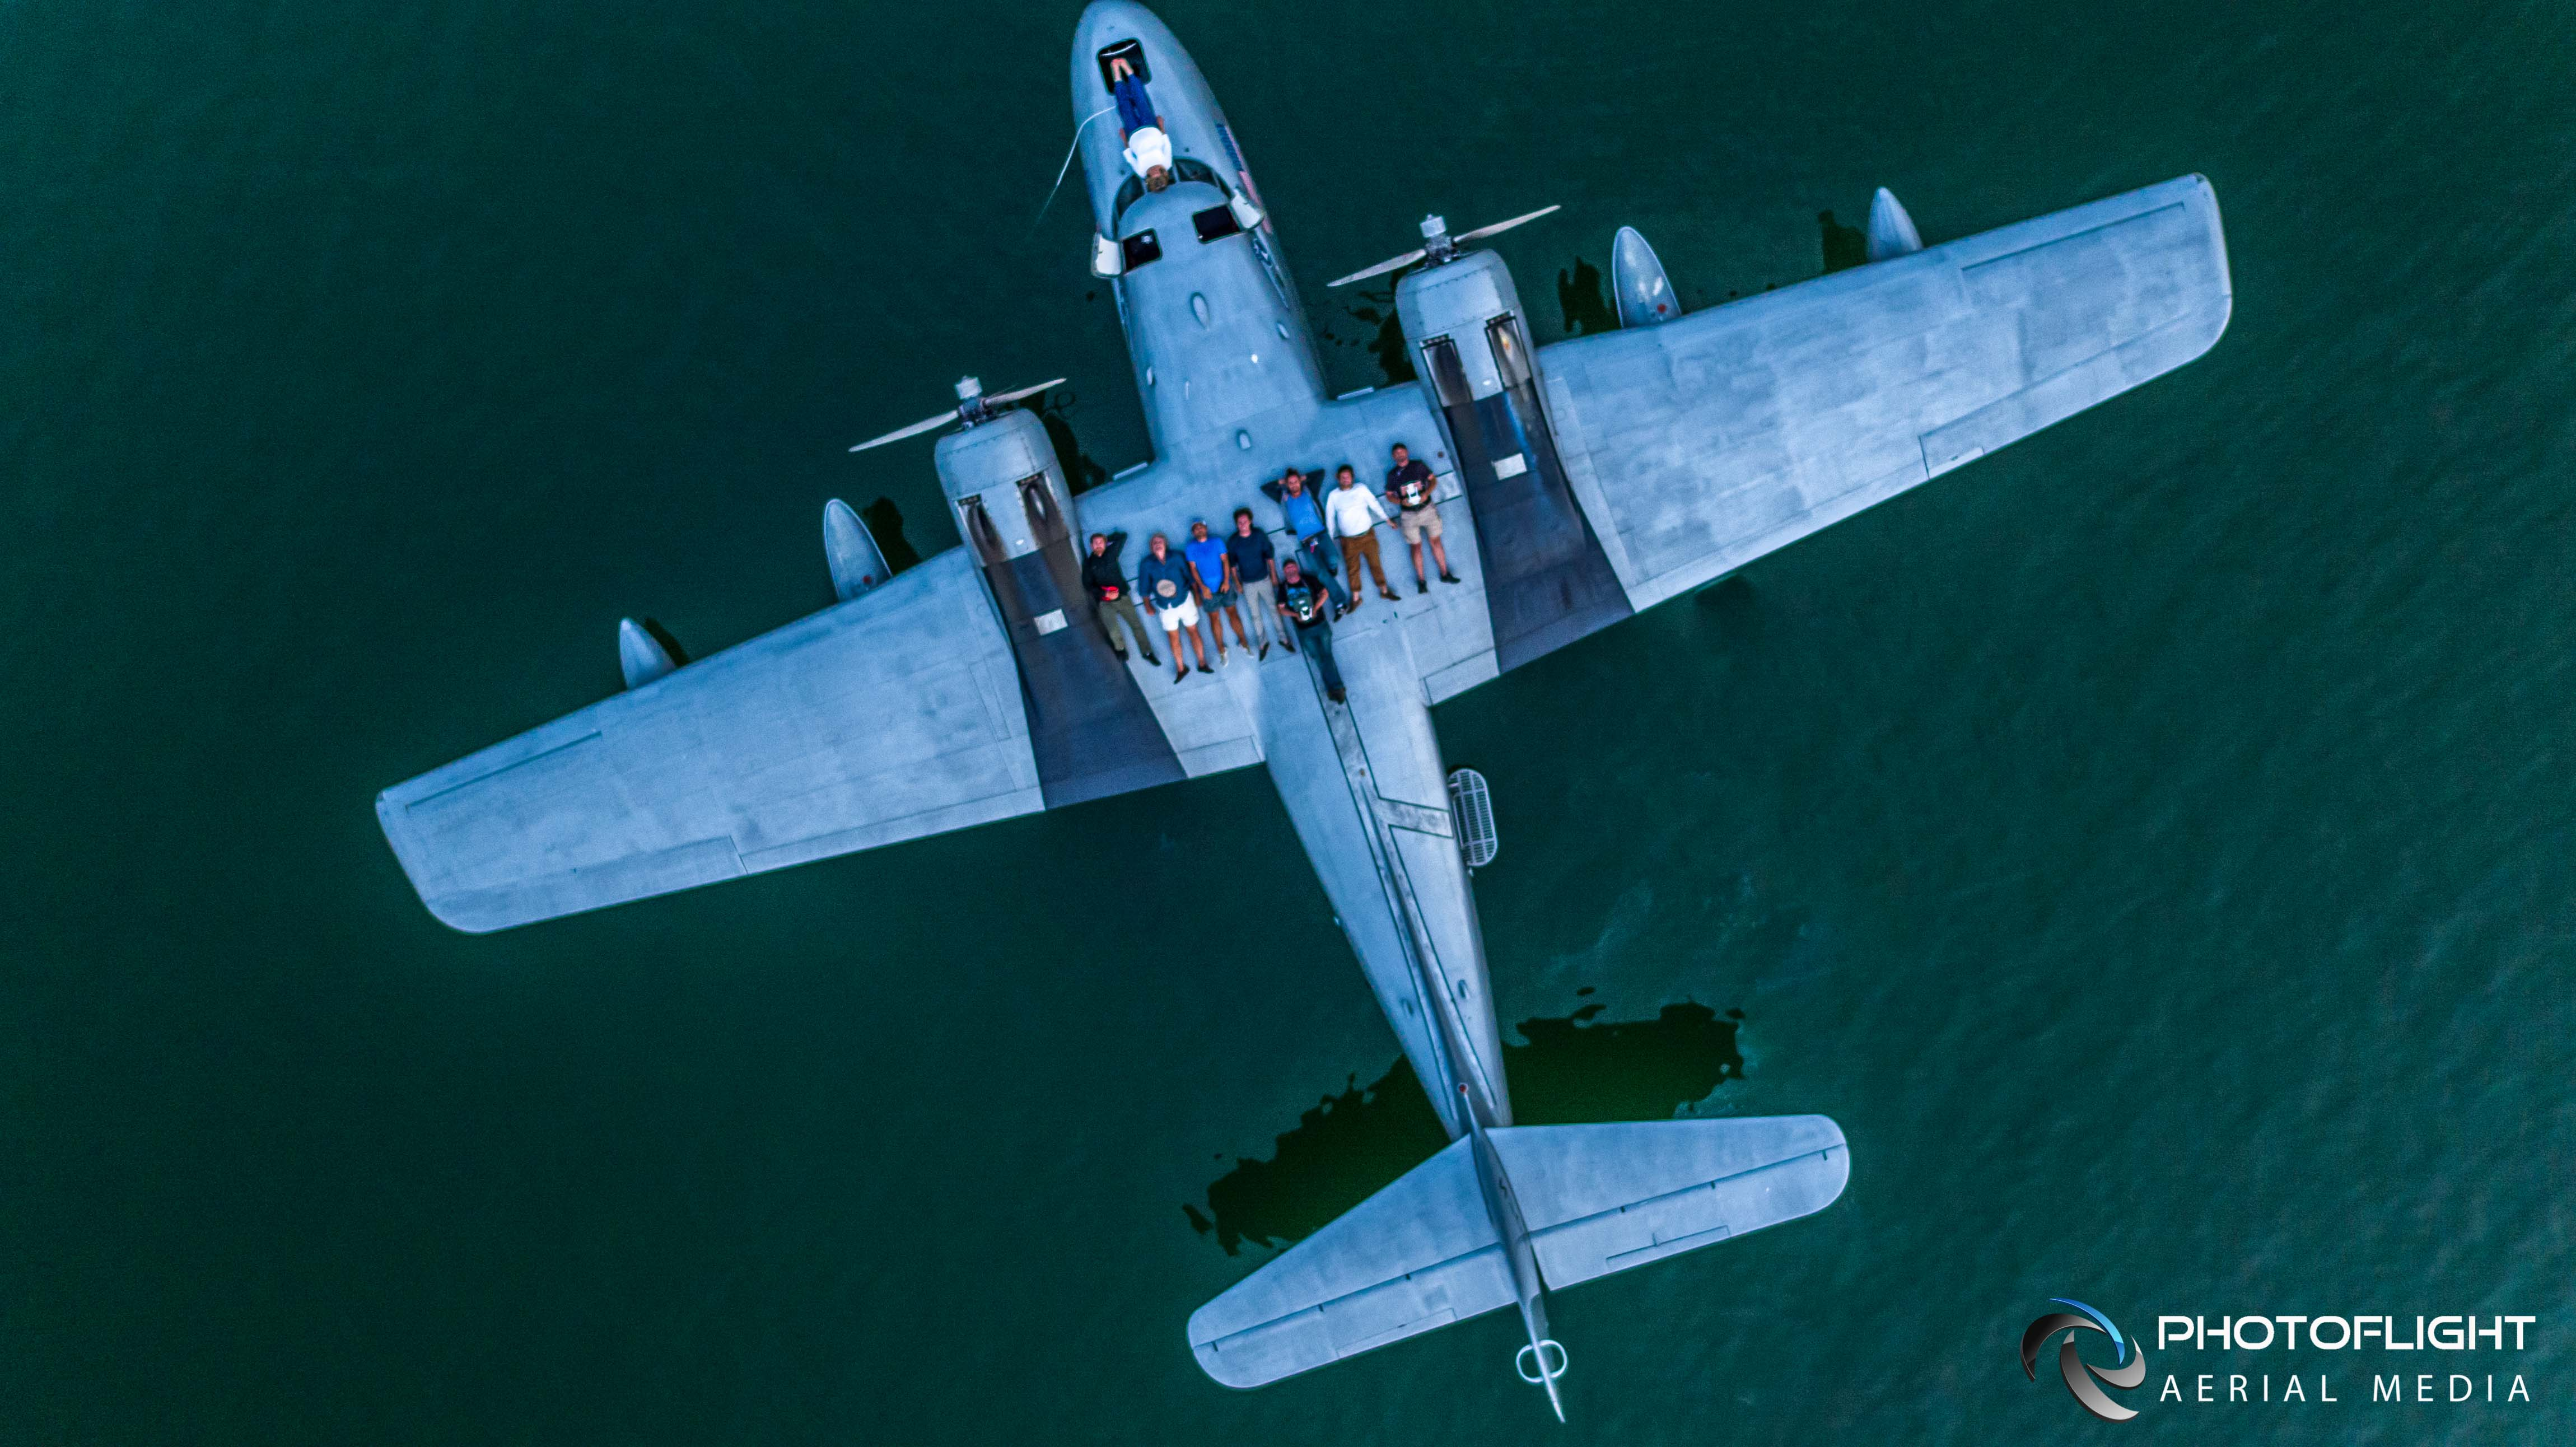 Grumman Albatross Flying Boat Film - Drone Photography and video by Photoflight Aerial Media-CT, NY, MA, NJ, drone operator